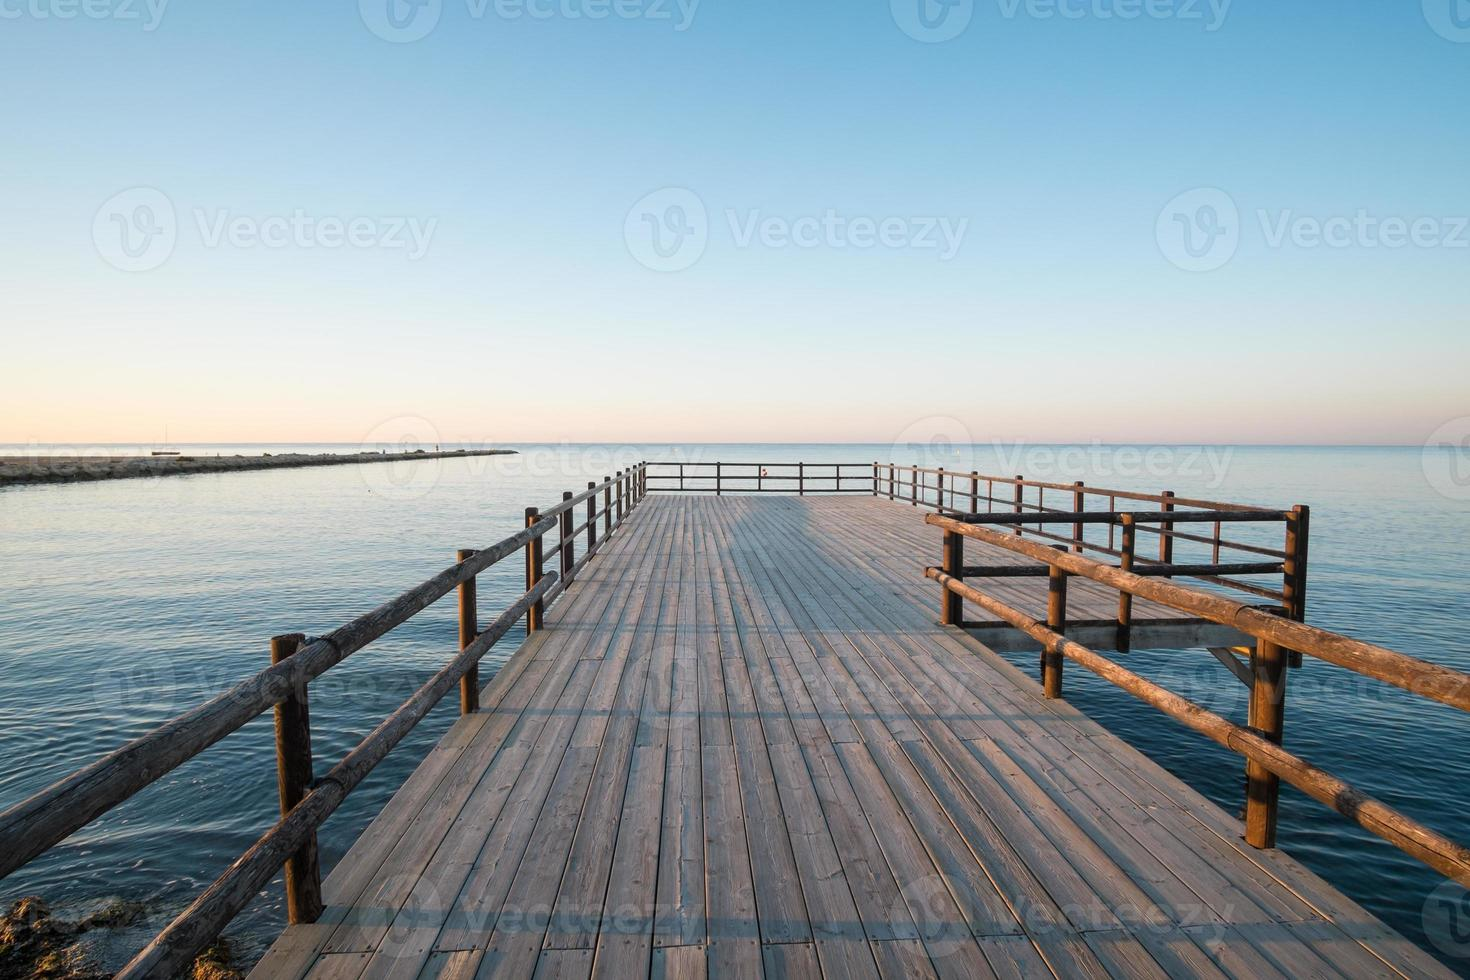 Wooden jetty photo